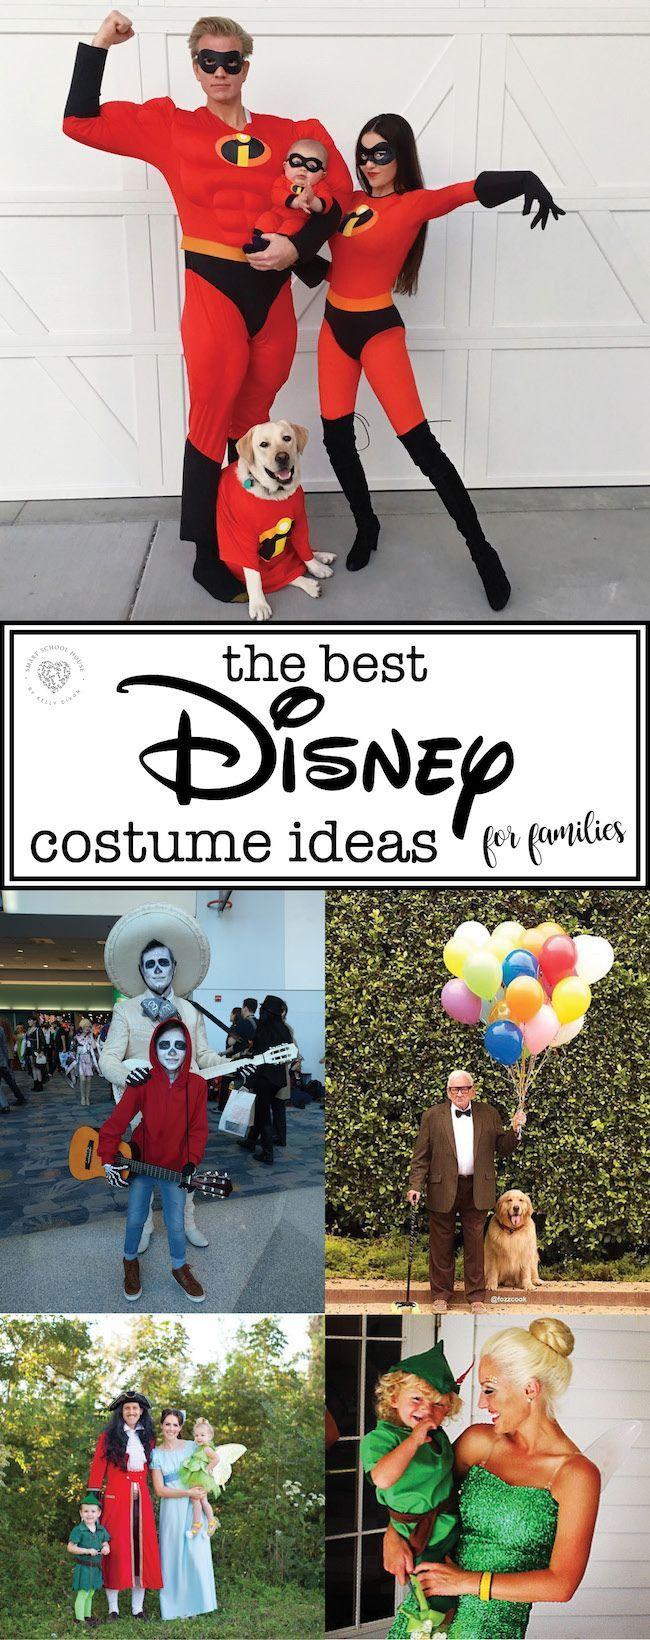 Disney halloween costume ideas for families halloween pinterest